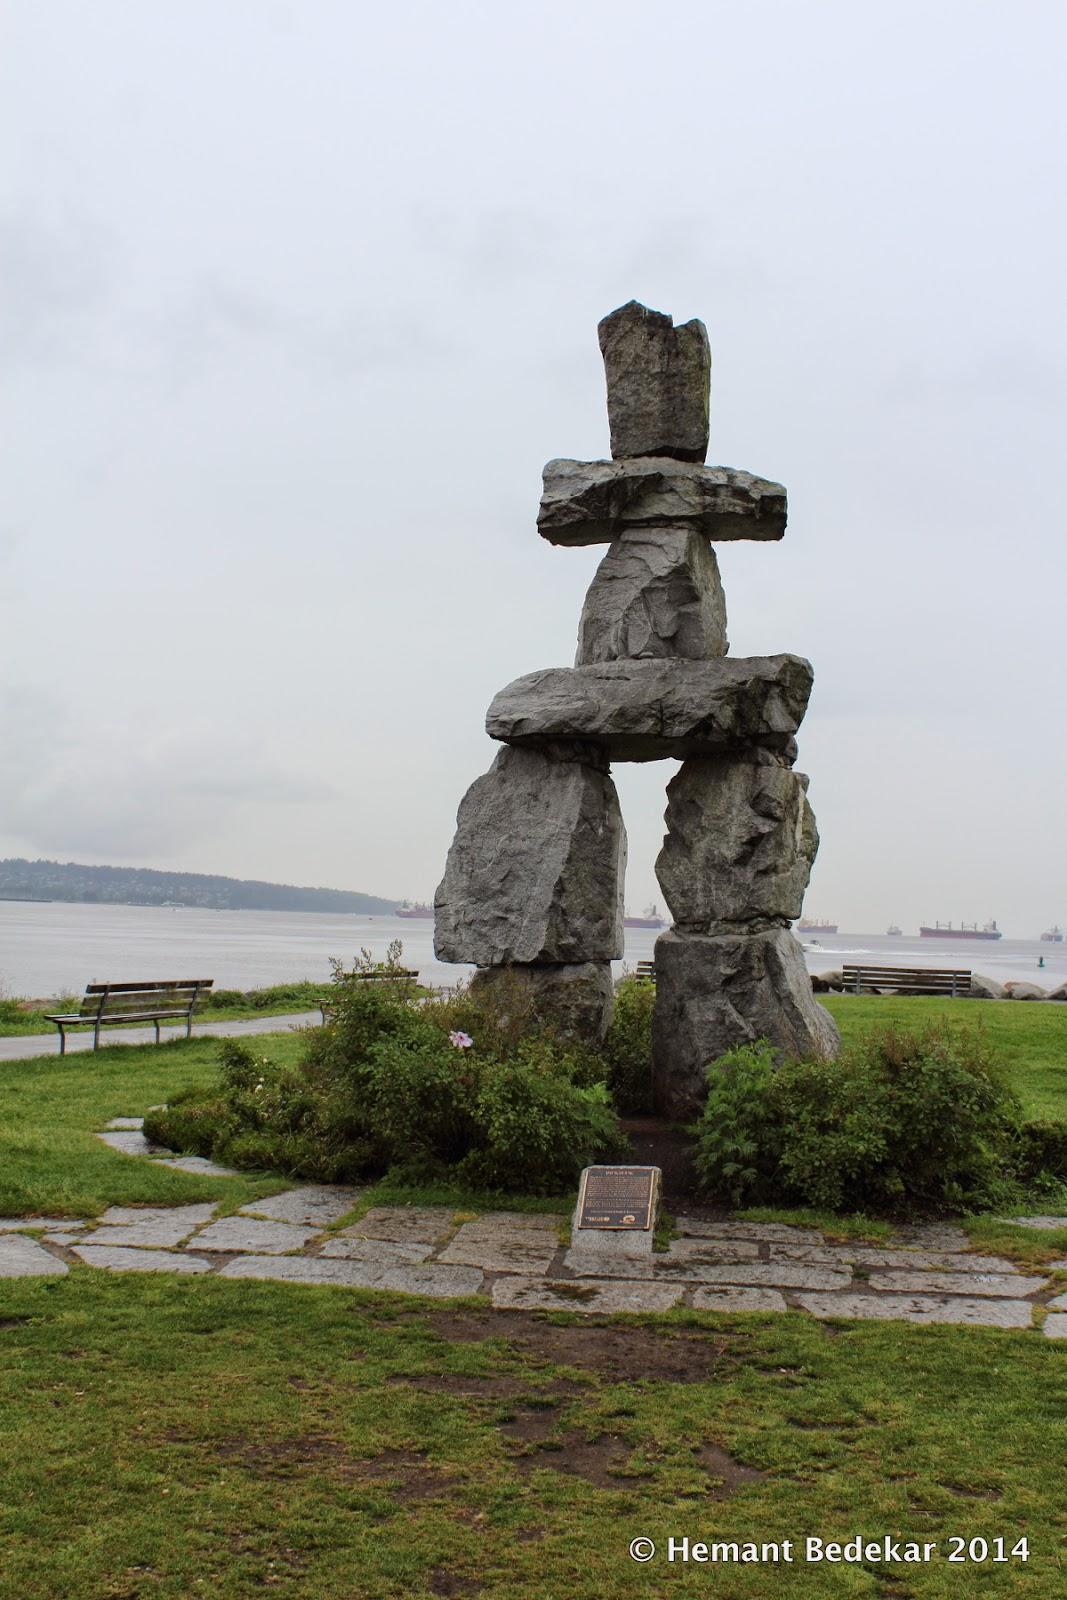 Inukshuk - An ancient symbol of the Inuit culture (https://en.wikipedia.org/wiki/Inuksuk)